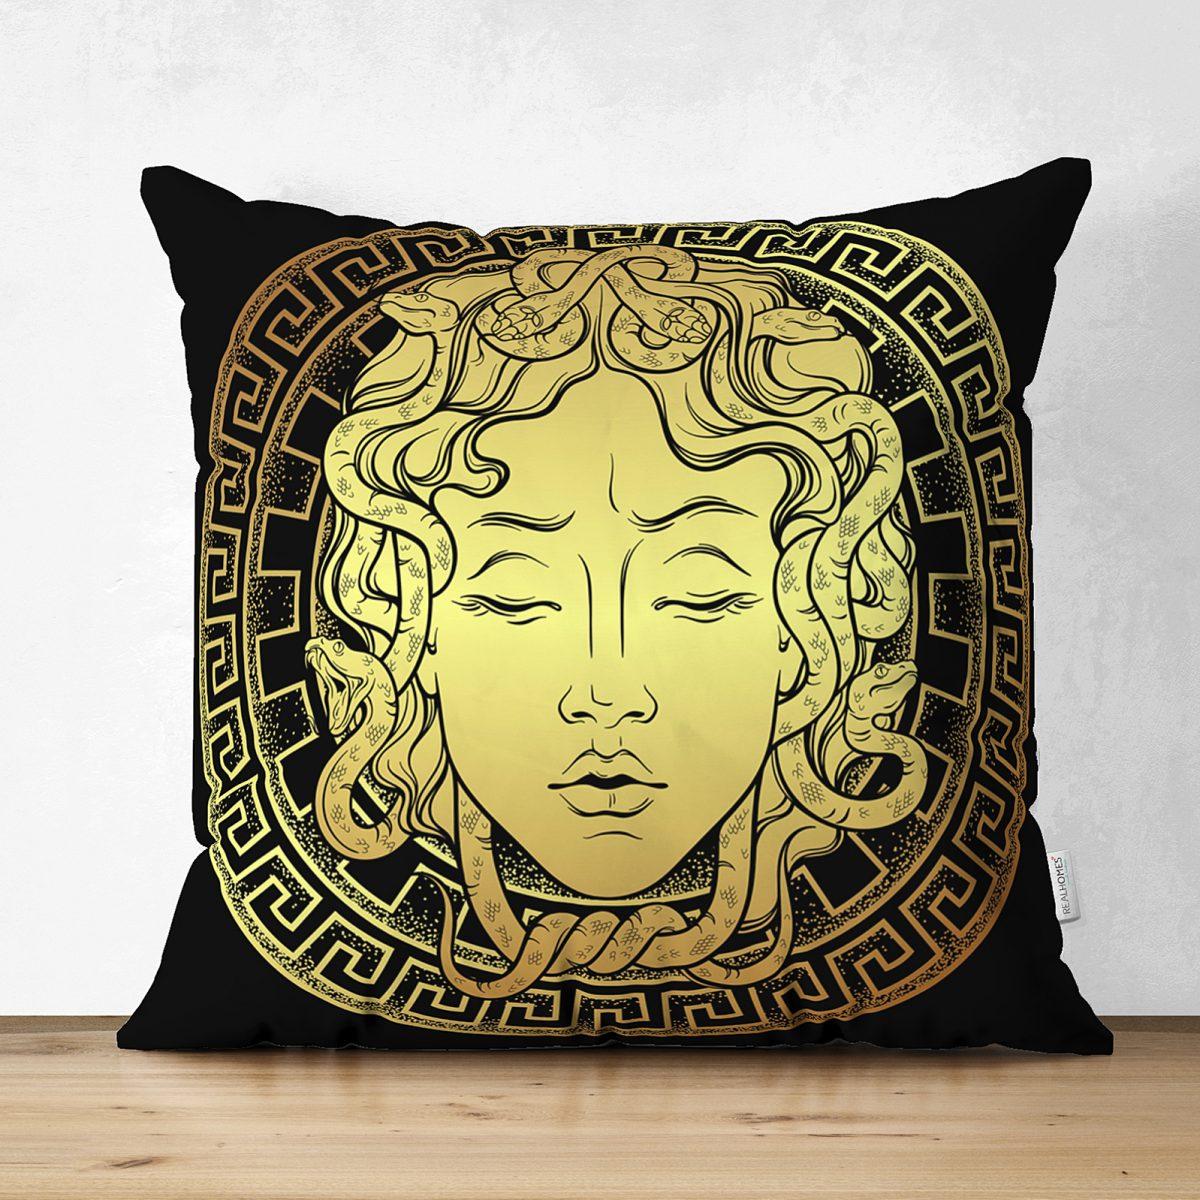 Realhomes Çift Taraflı Özel Tasarım Siyah Zeminde Gold Medusa Dekoratif Süet Kırlent Kılıfı Realhomes